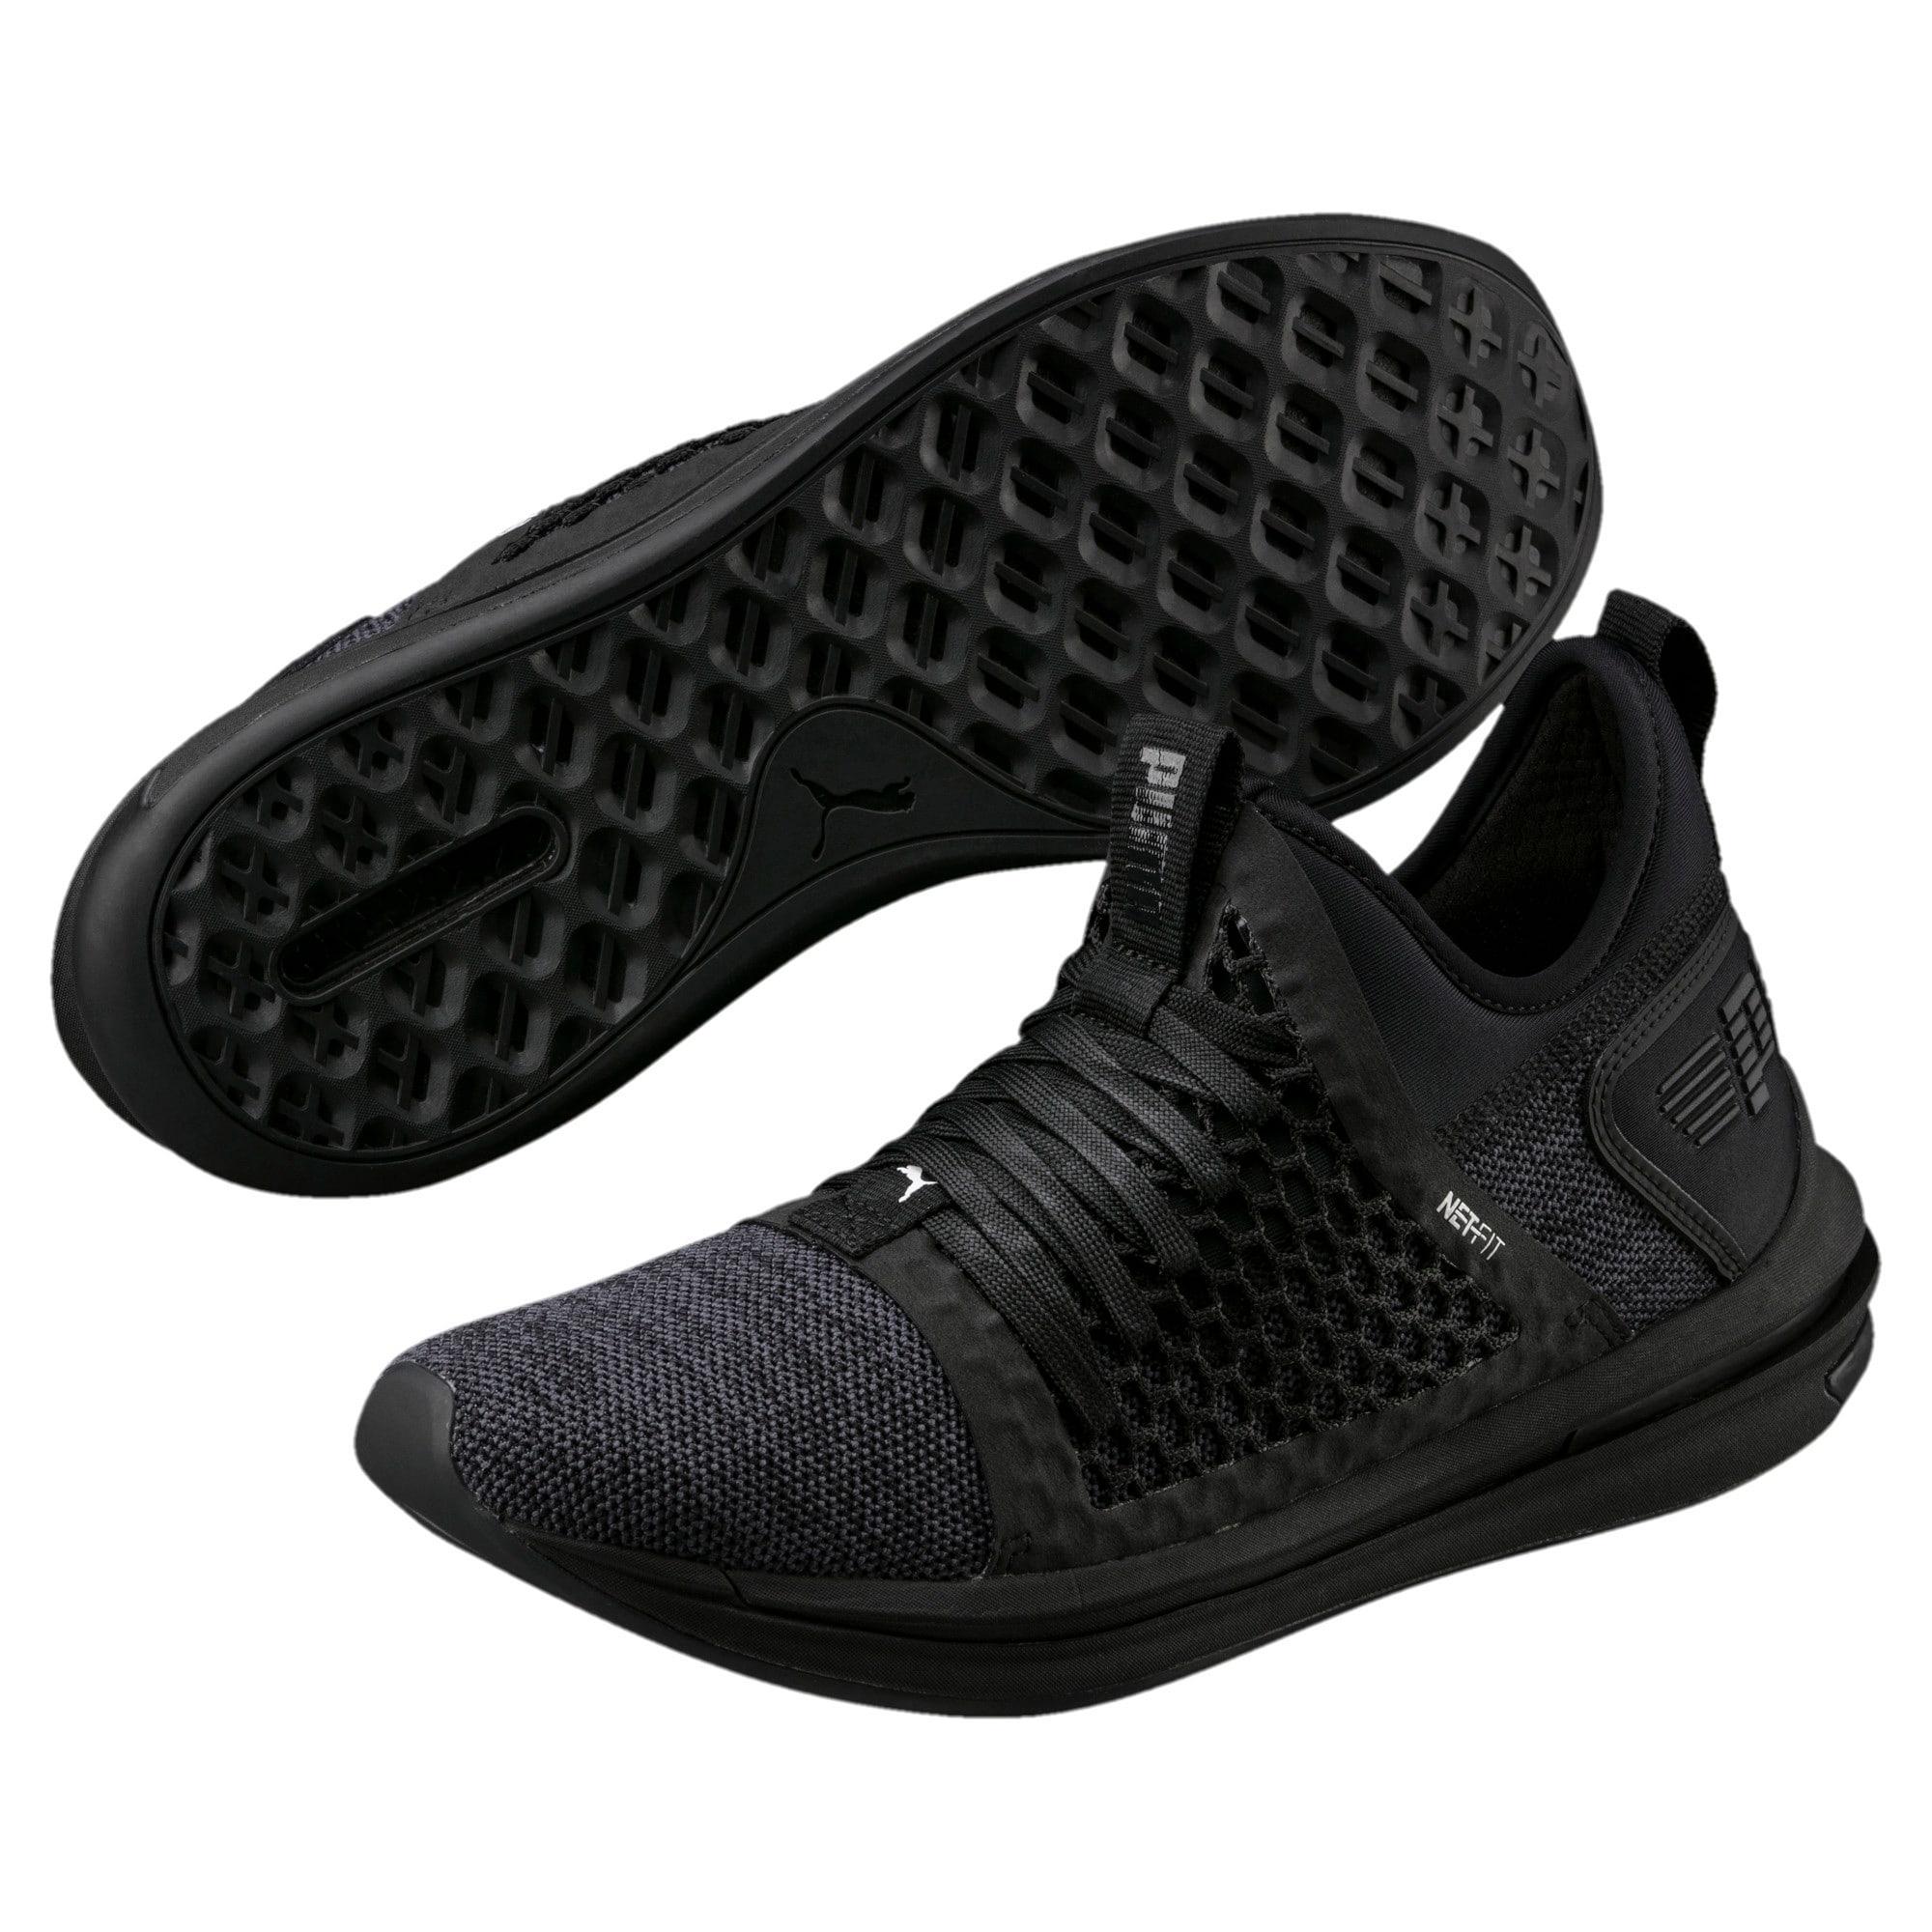 Thumbnail 2 of IGNITE Limitless SR NETFIT Men's Trainer Shoes, Puma Black, medium-IND